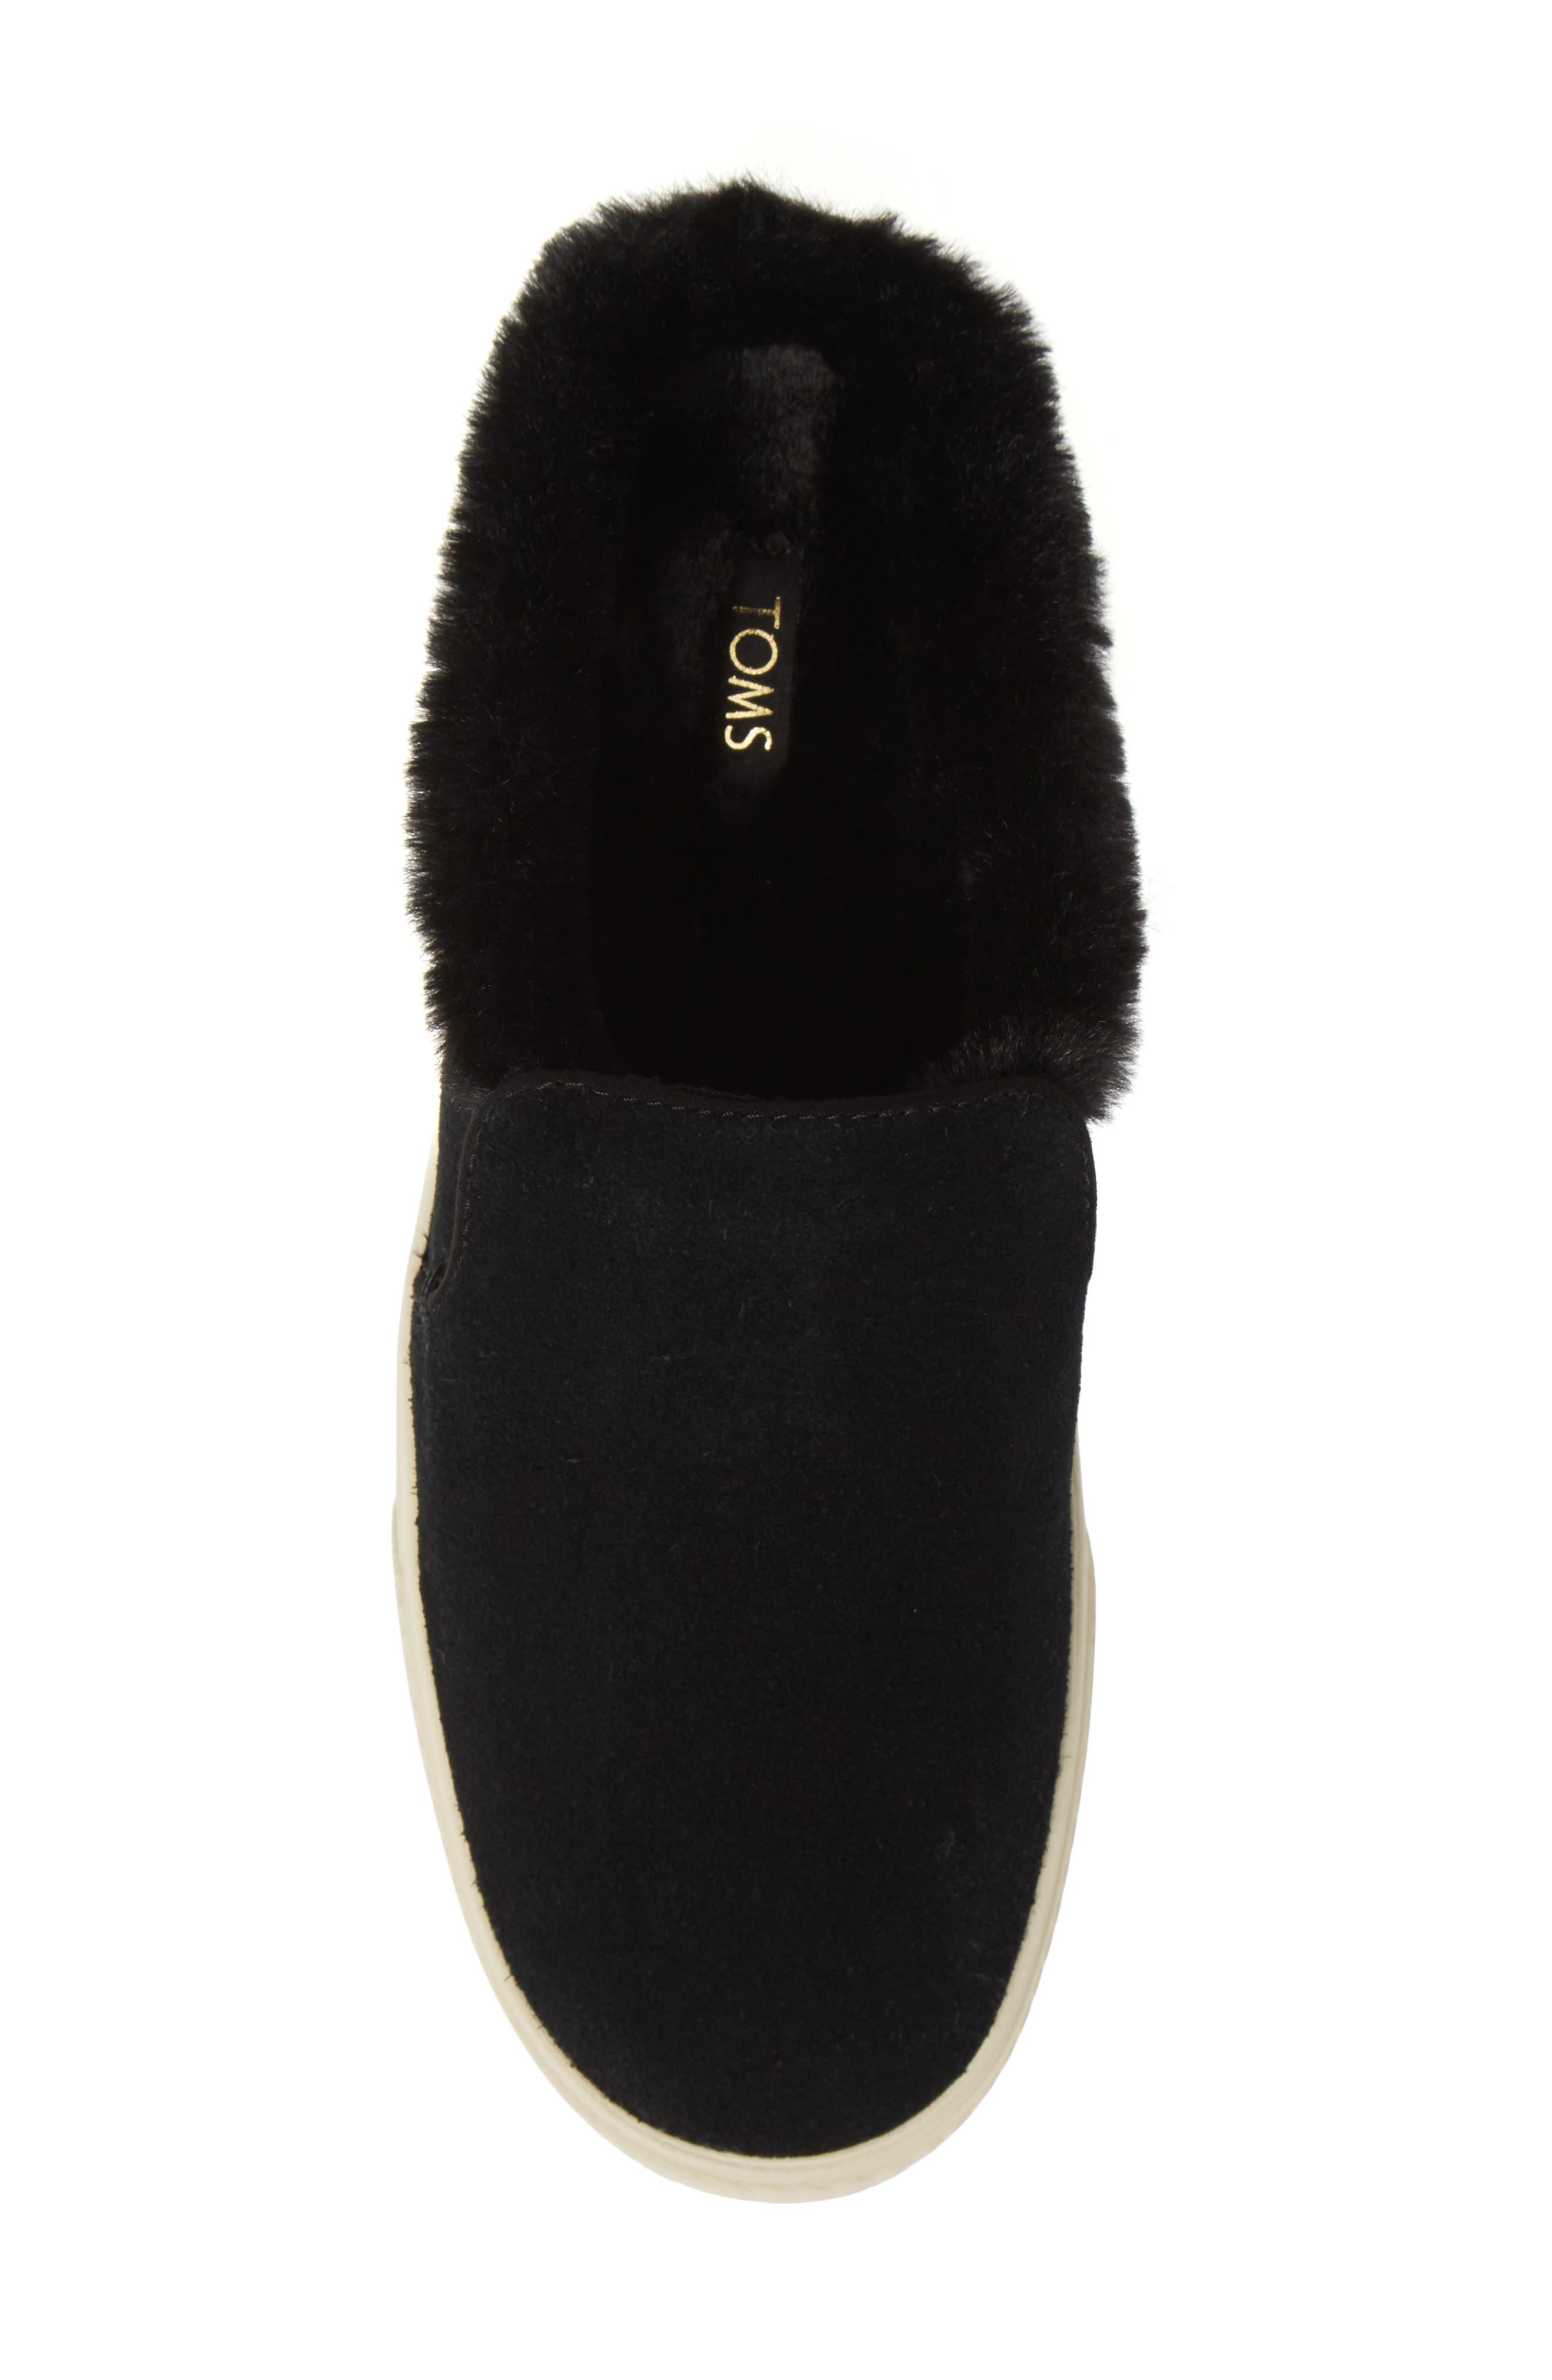 TOMS, Sunrise Faux Fur Lined Slip-On Sneaker, Alternate thumbnail 5, color, BLACK SUEDE